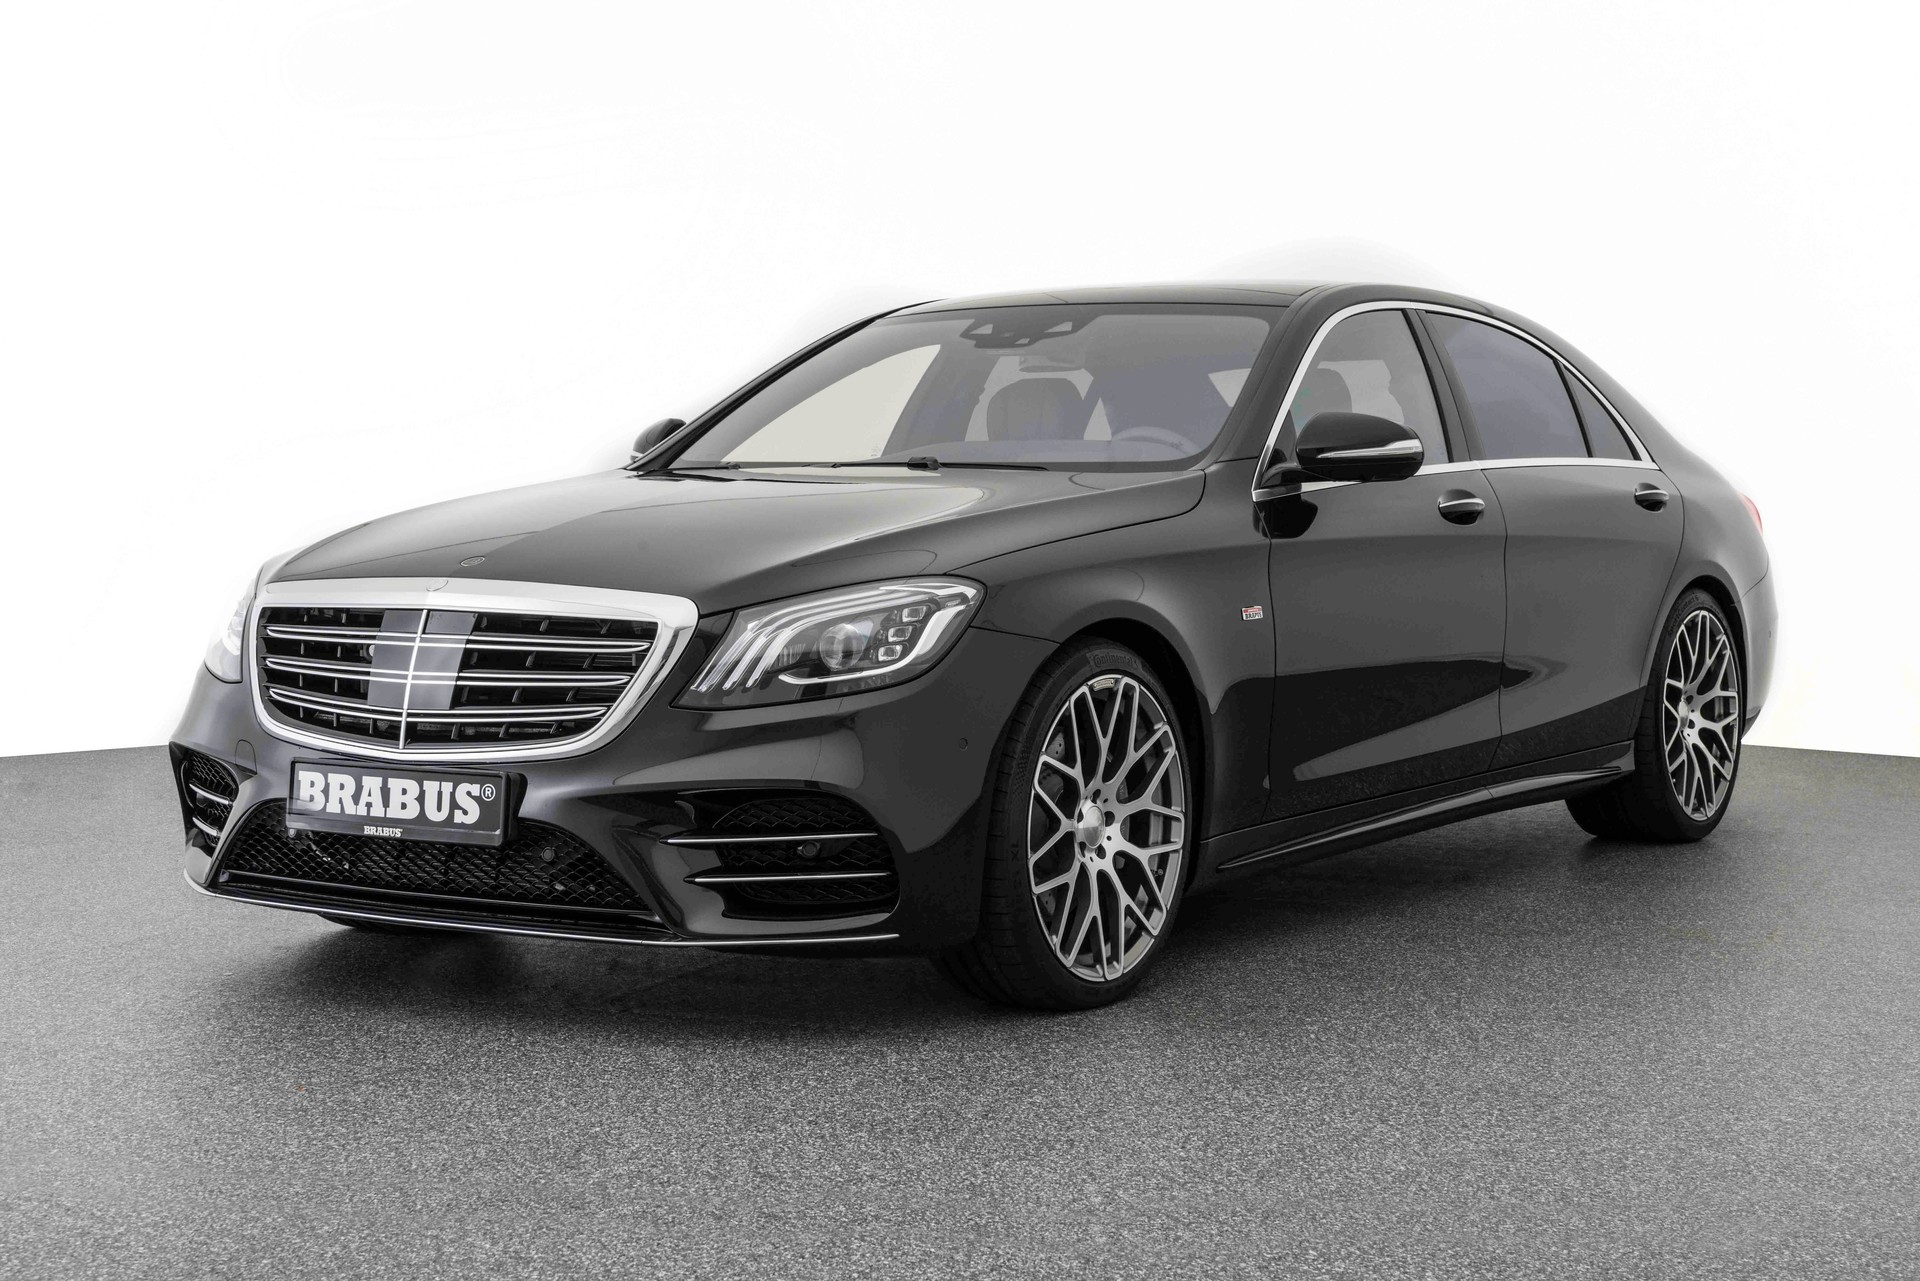 Mercedes brabus s 550